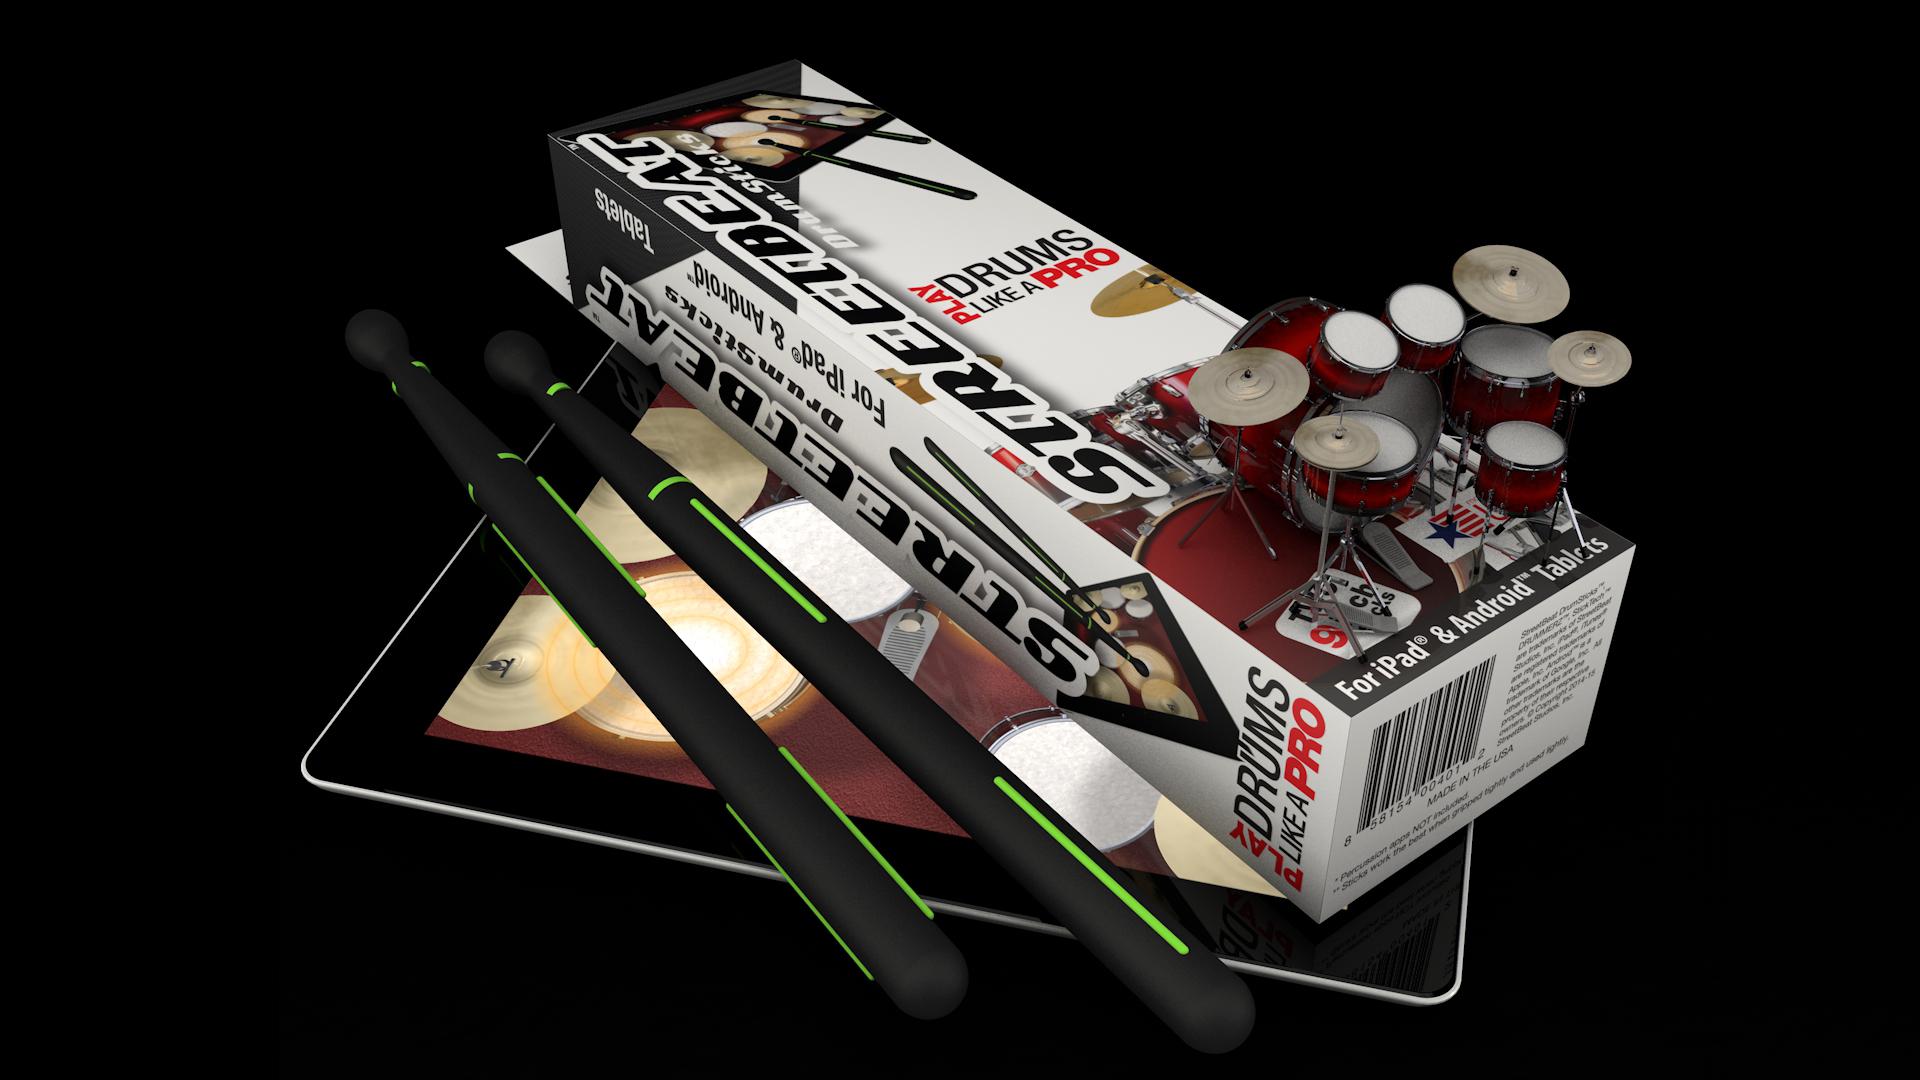 StreetBeat Drumsticks CGI of retail pack design on iPad